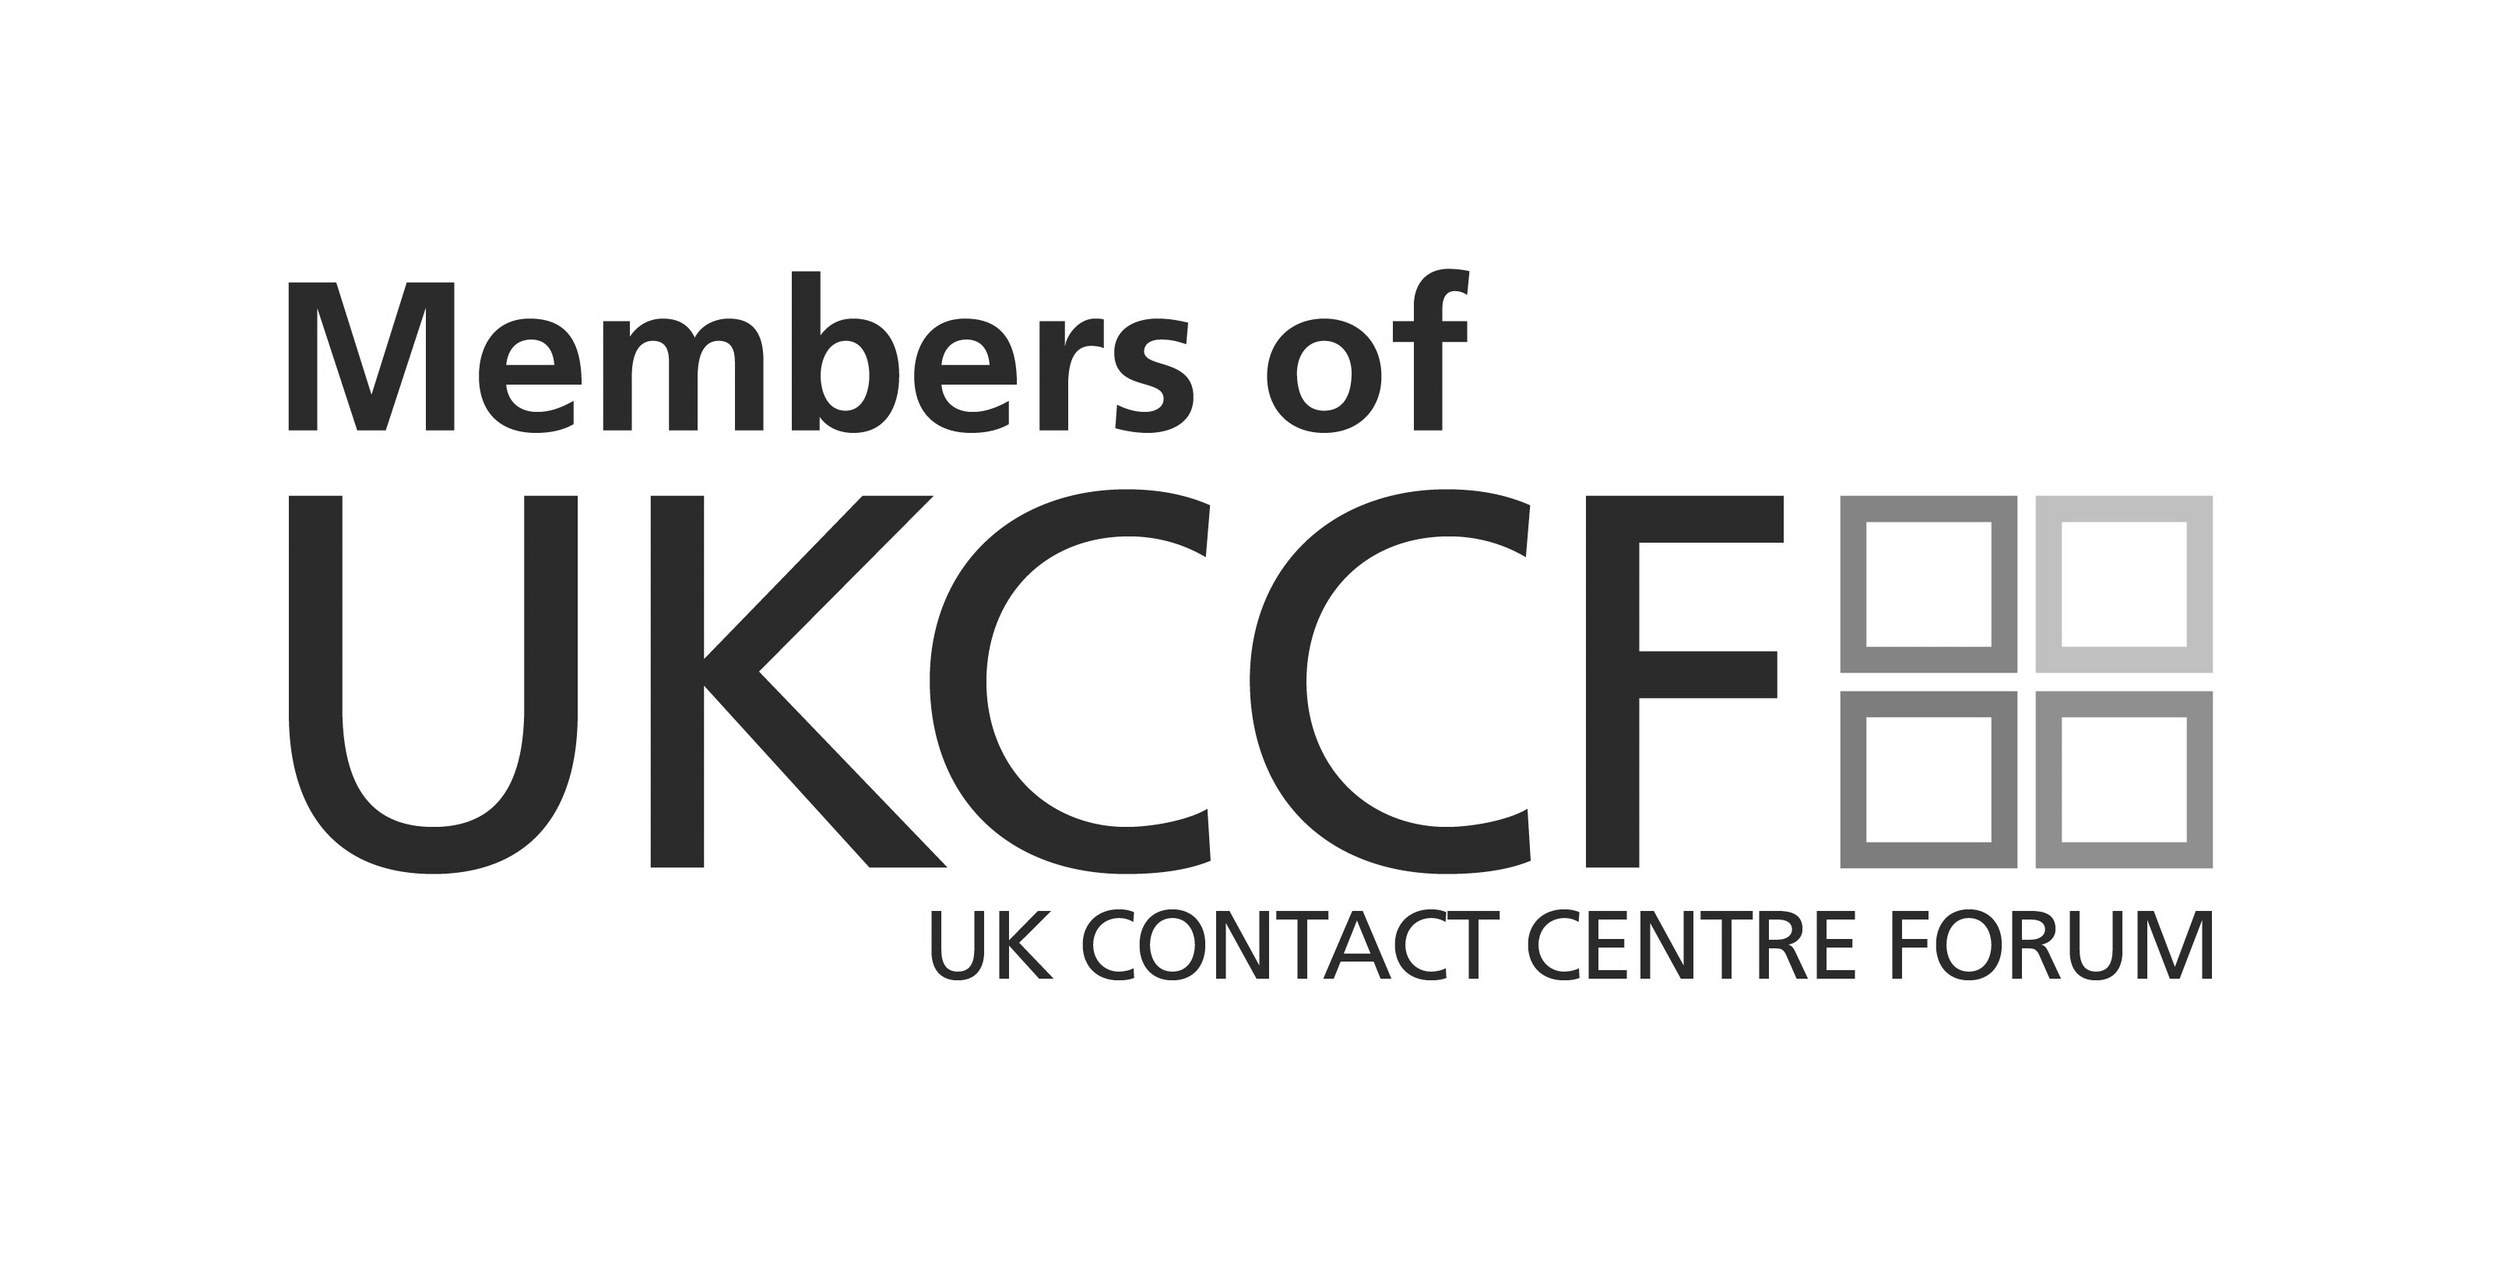 UKCCF_Logo_B&W.jpg